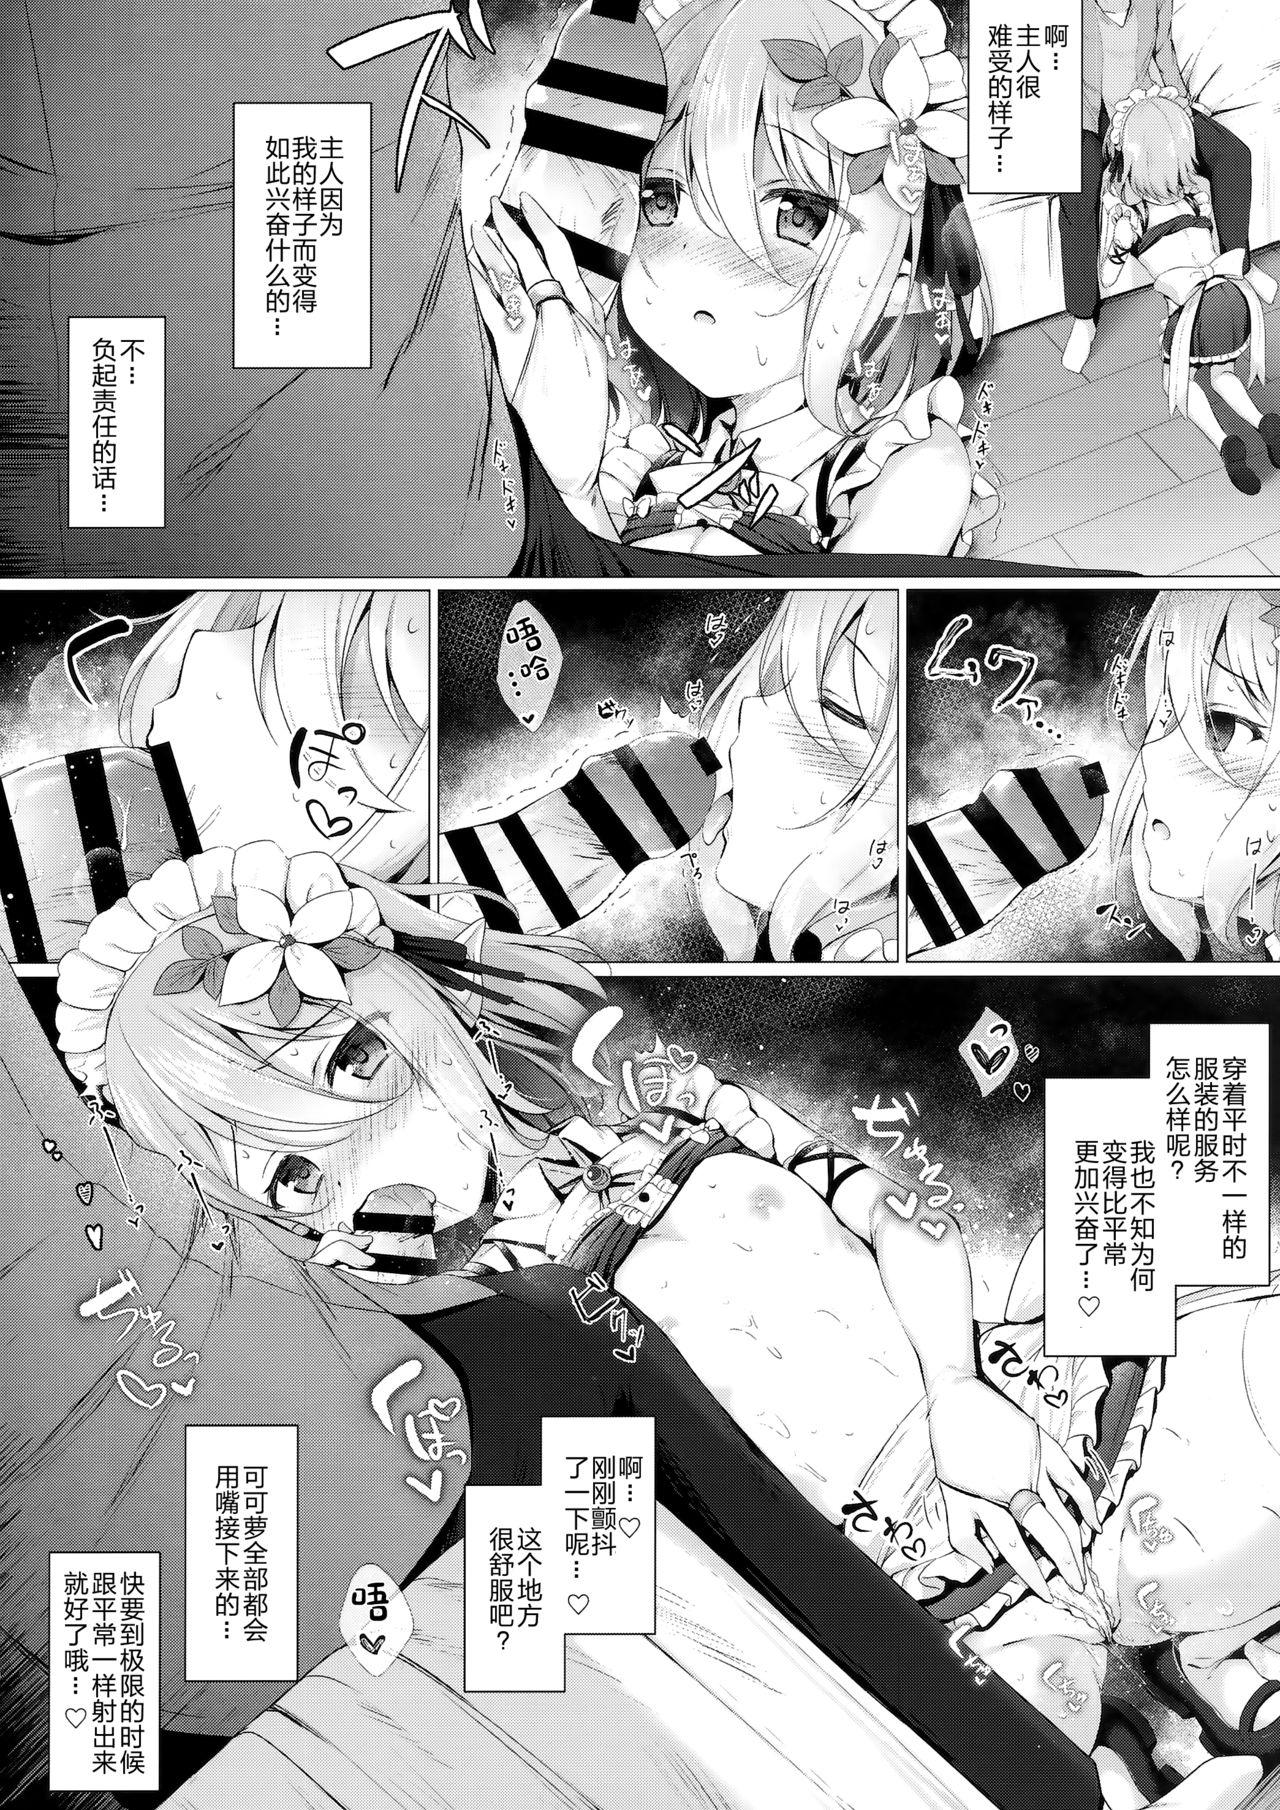 Maid Kokkoro-chan to Connect shitai!! 5